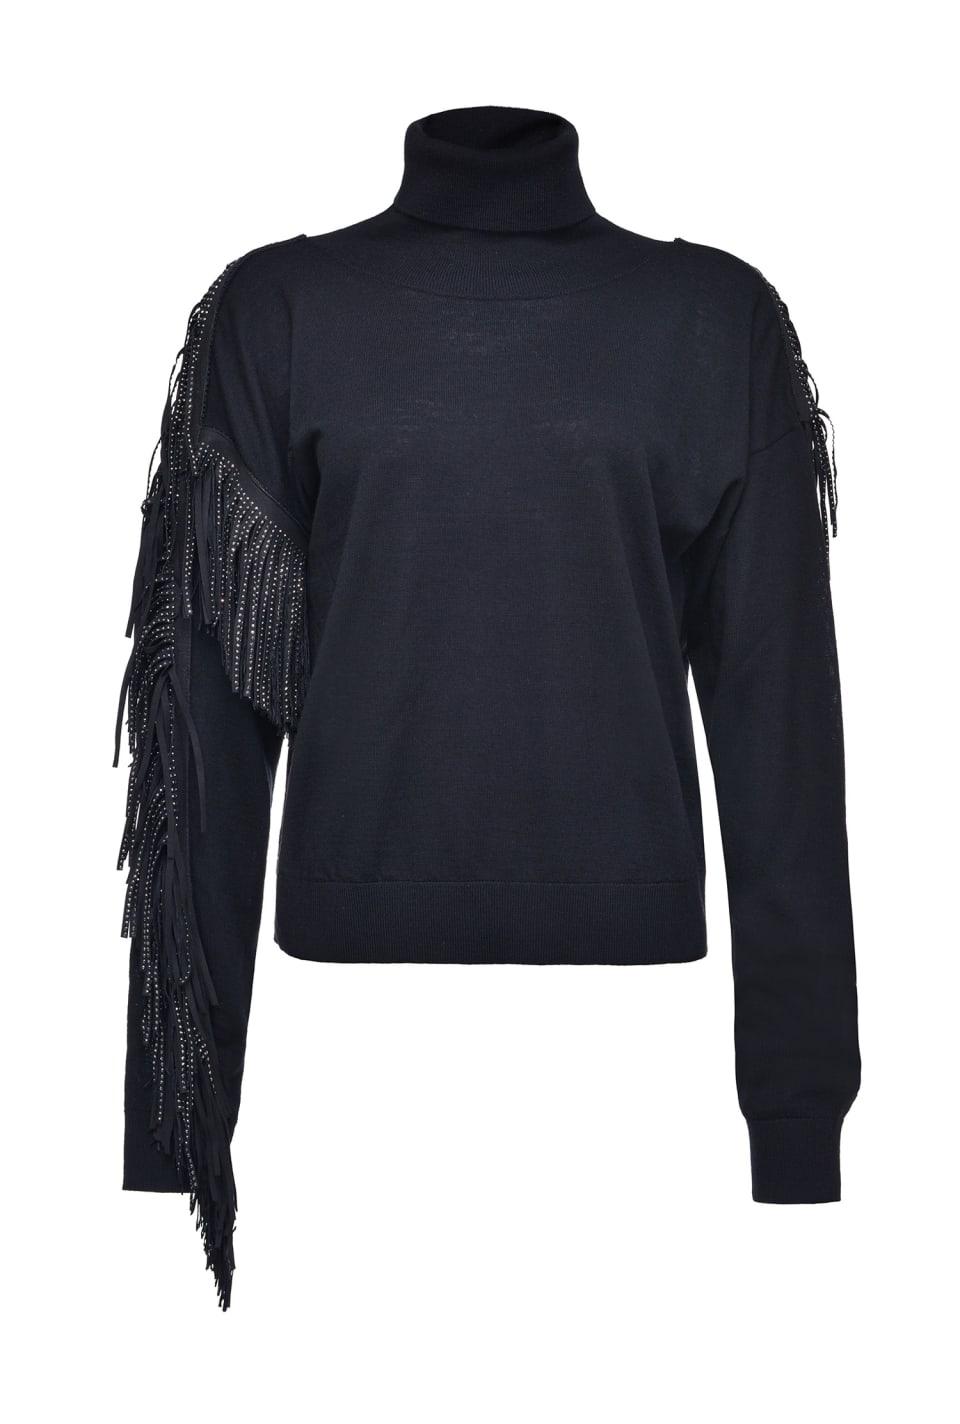 Rhinestone fringe pullover